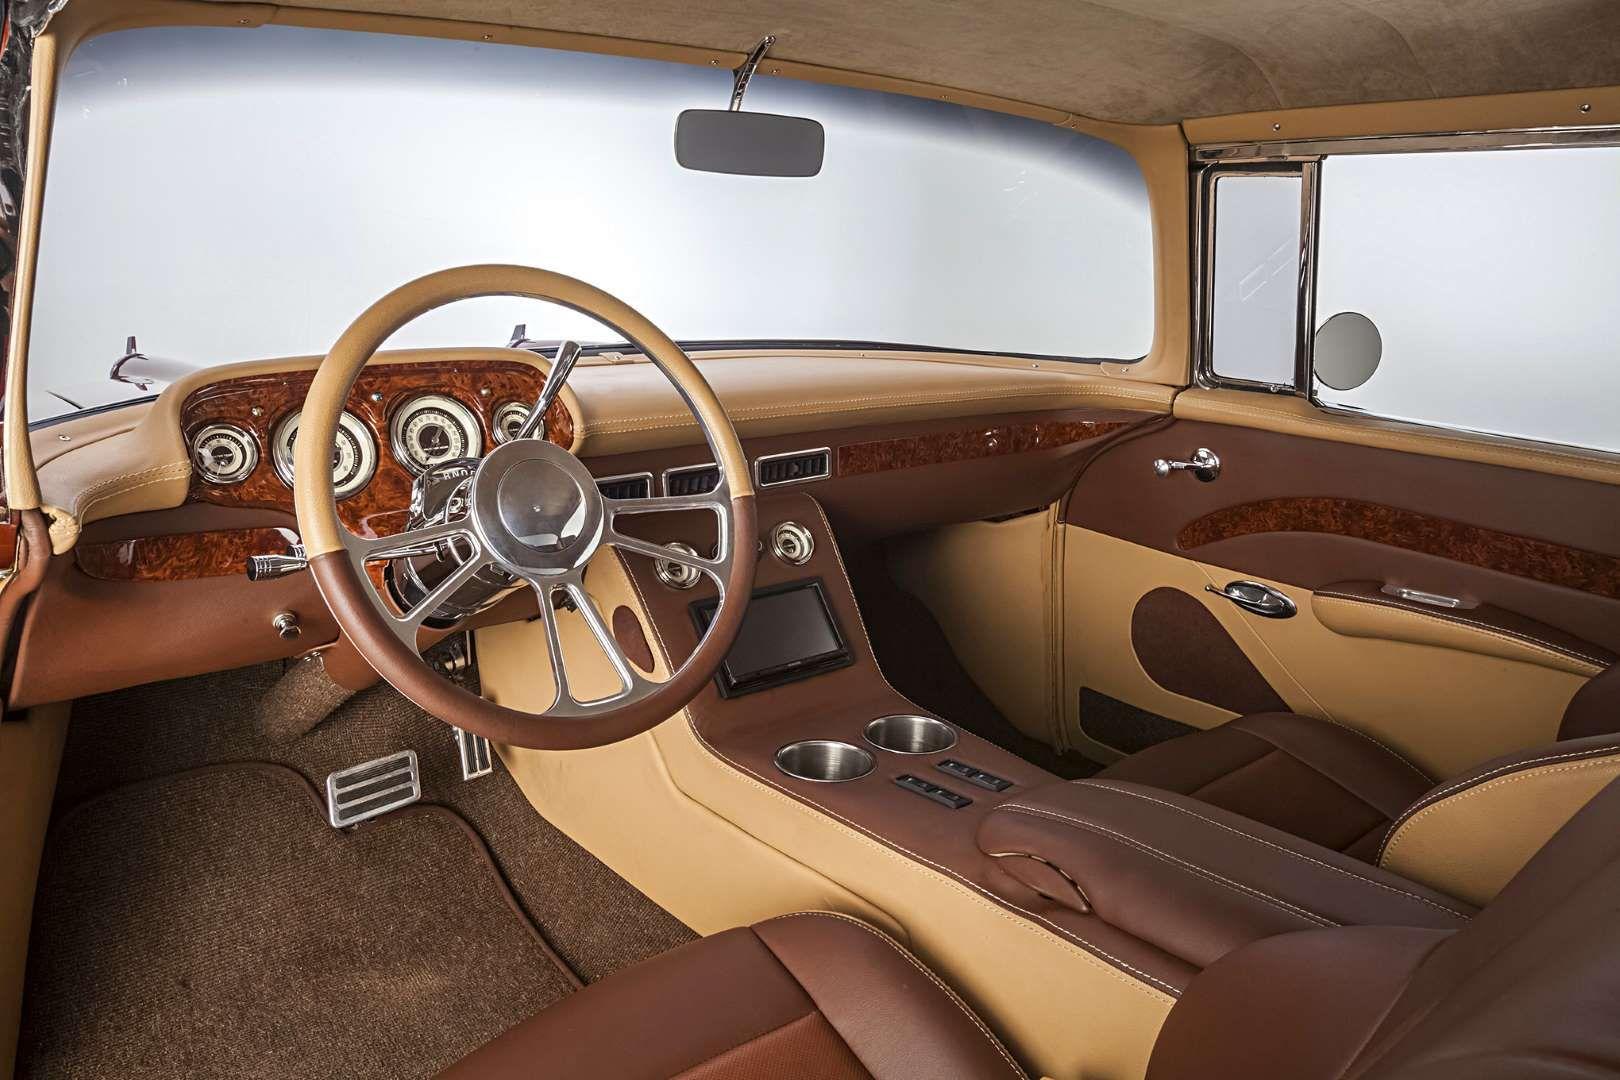 1957 Chevrolet Belair Left Interior Jorge Nunez With Images